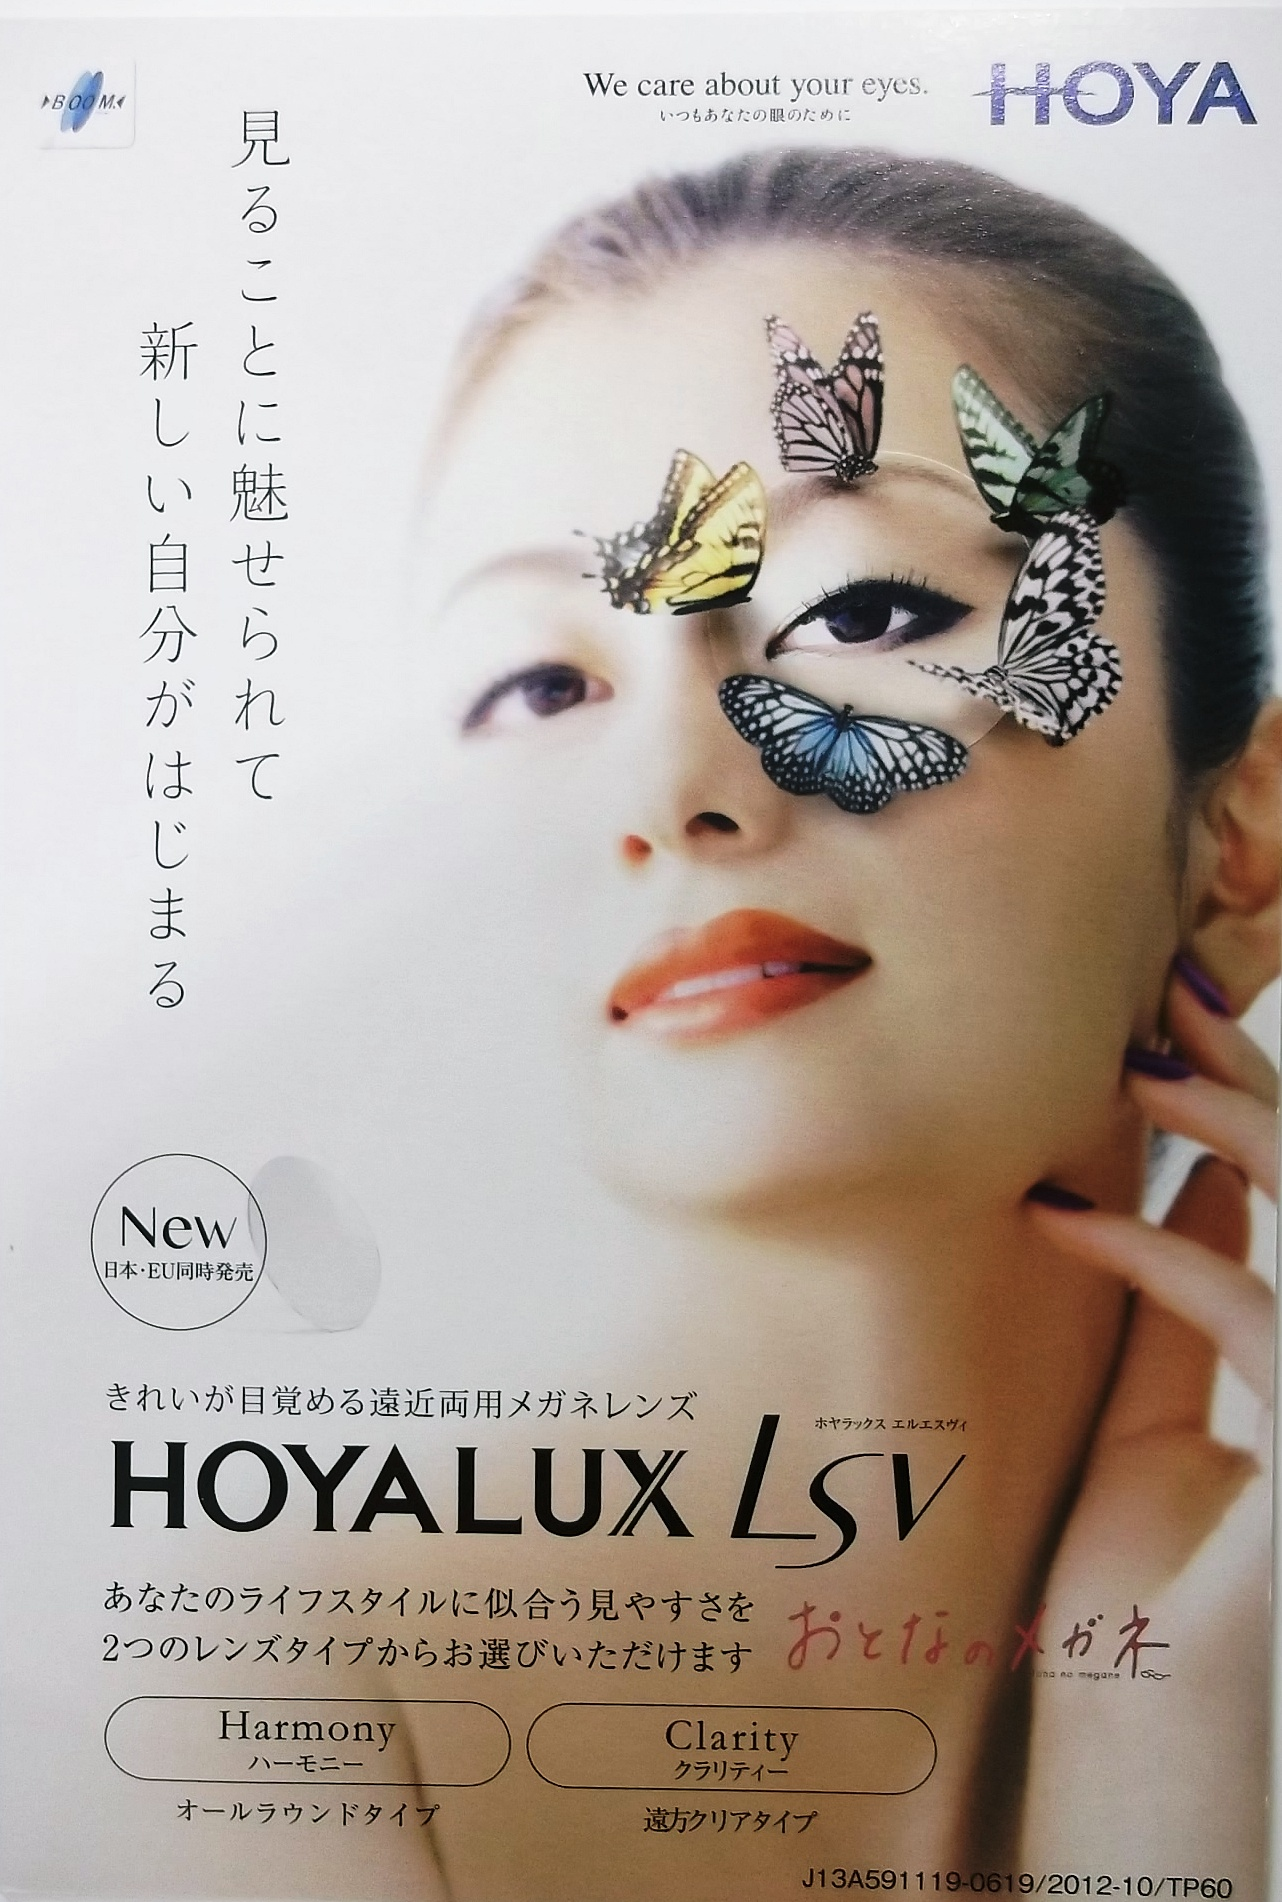 HOYALUX LSV